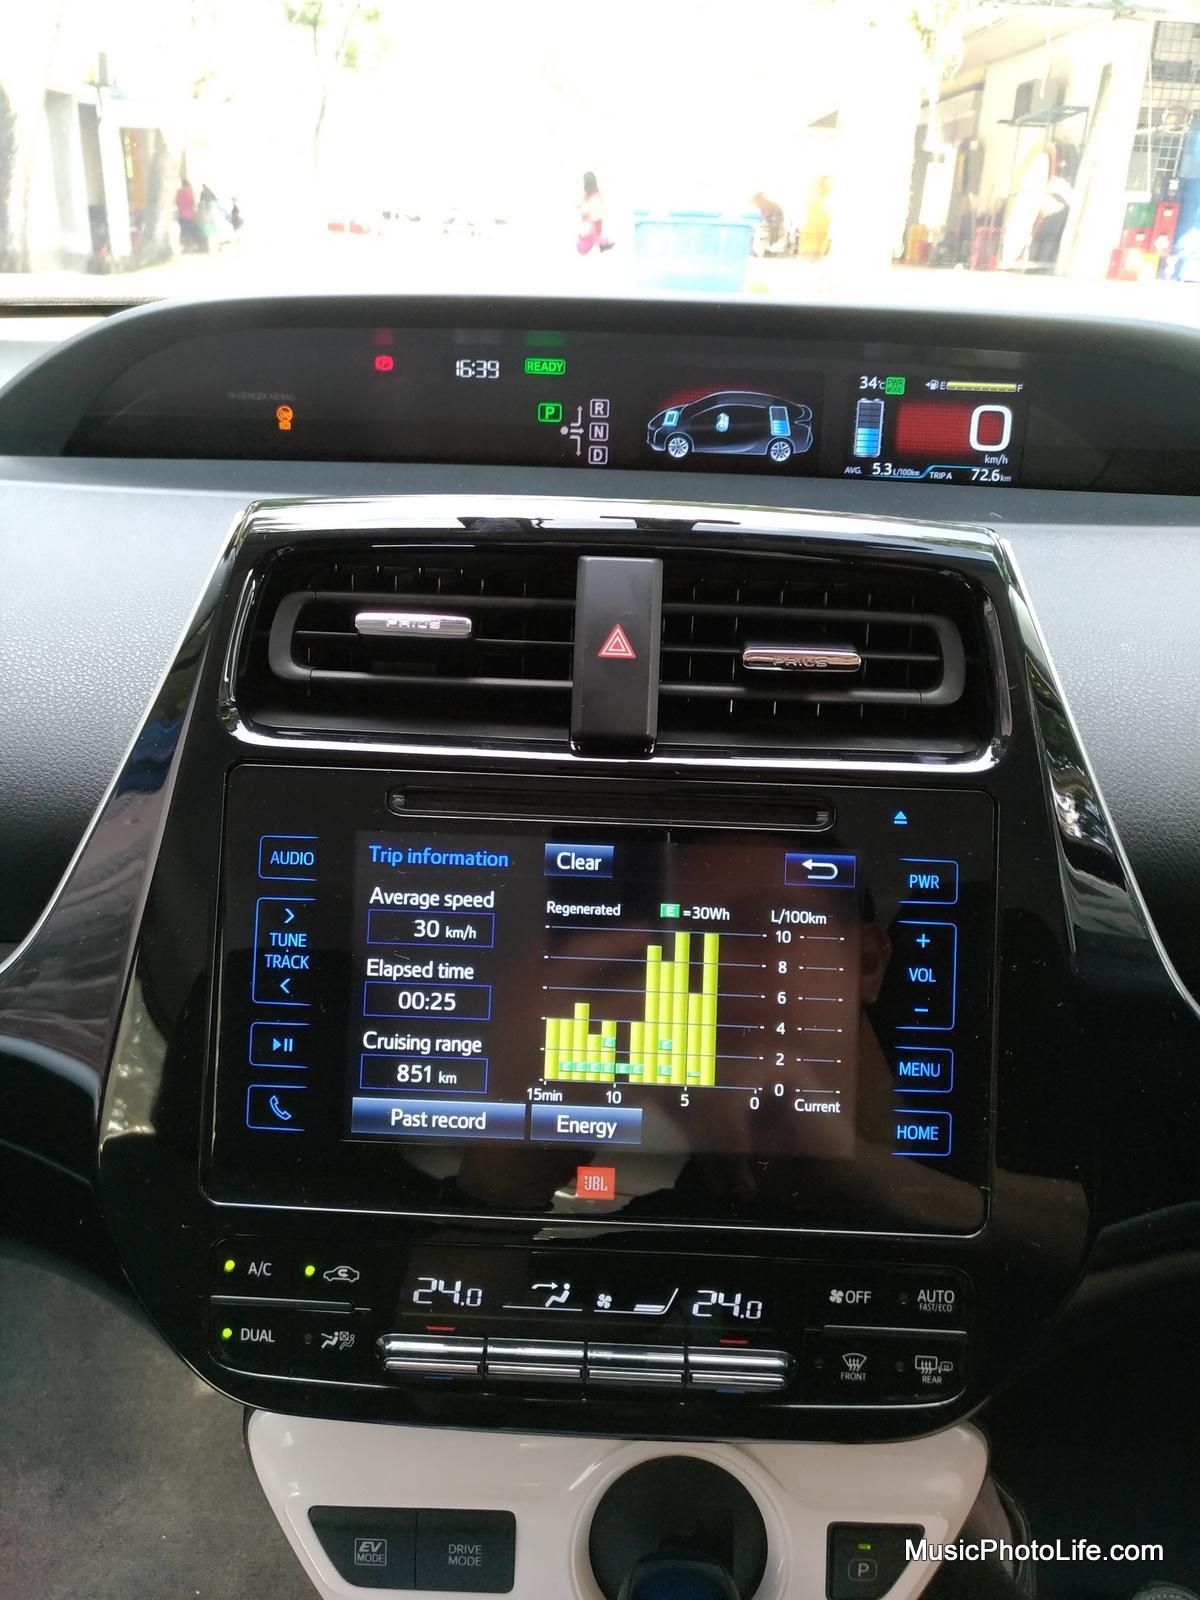 Toyota Prius 2016 multi-information display